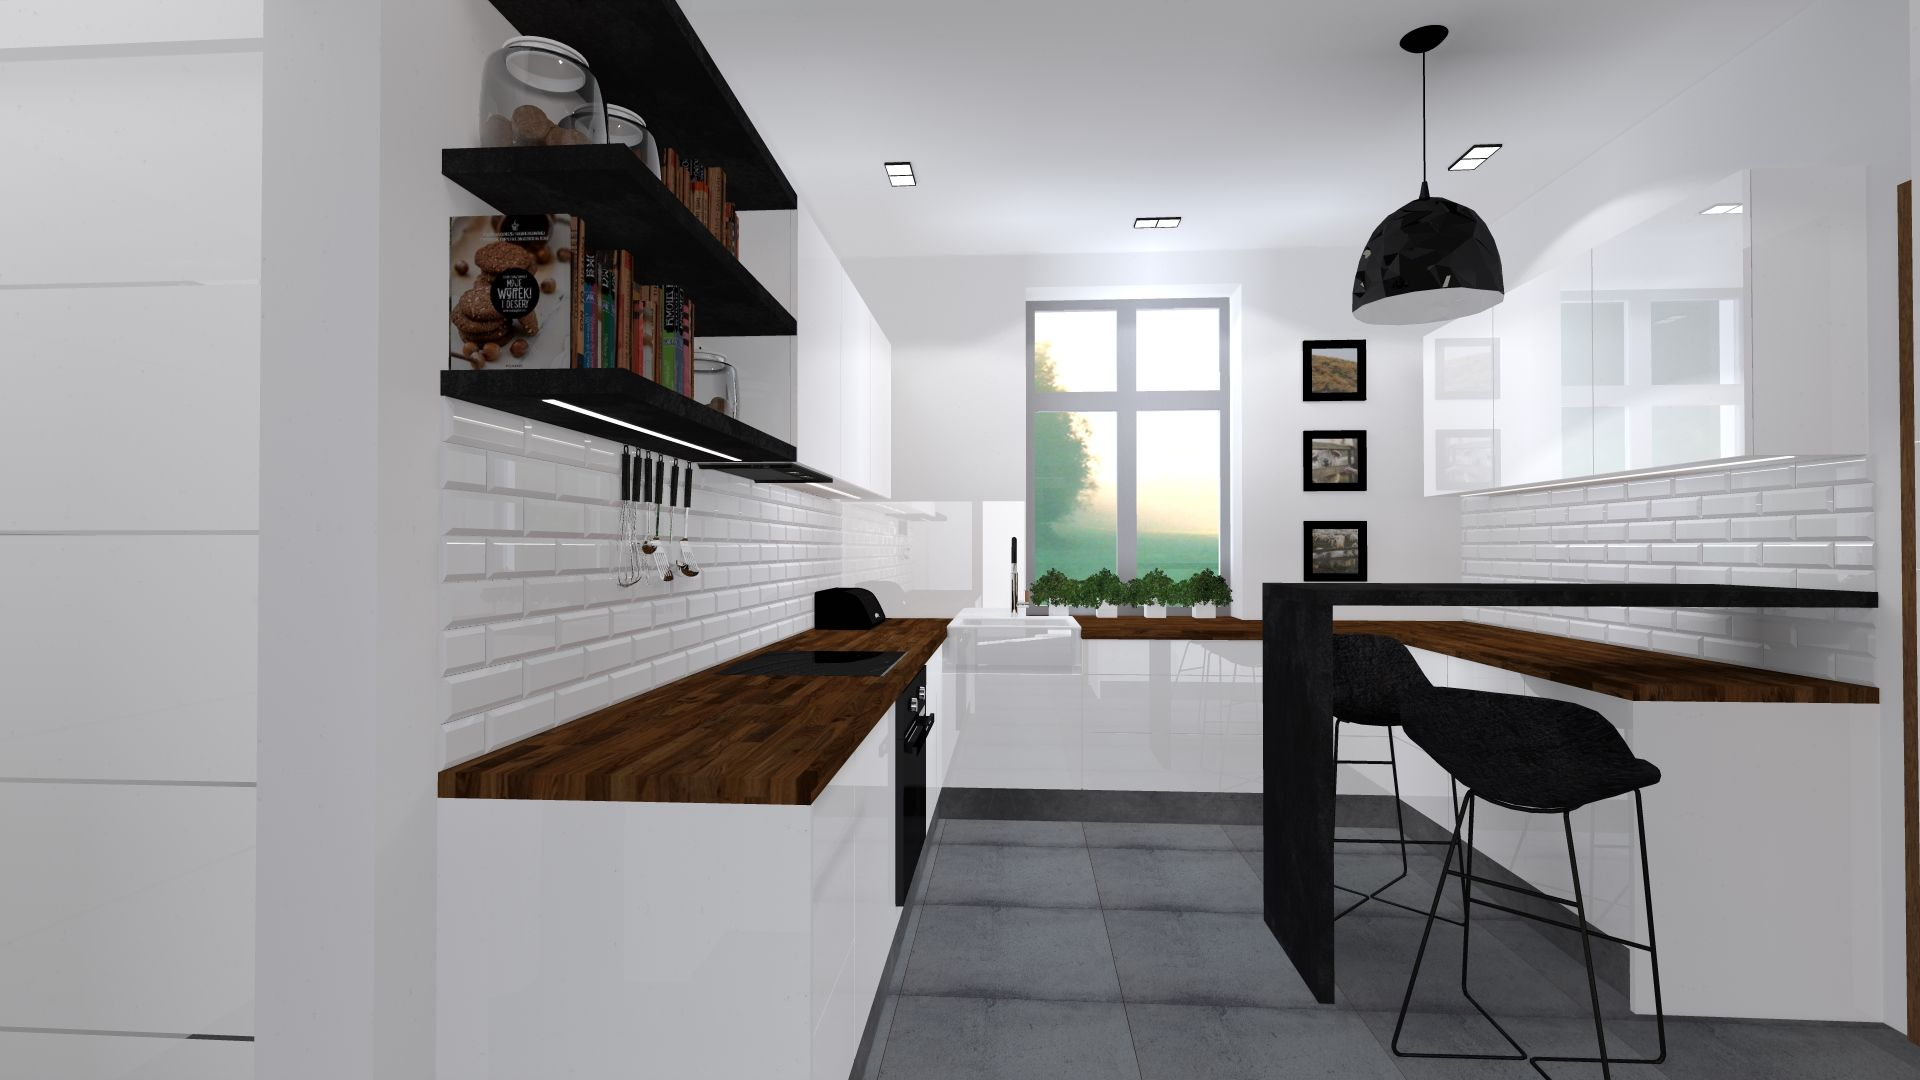 I kuchnia 3.jpg